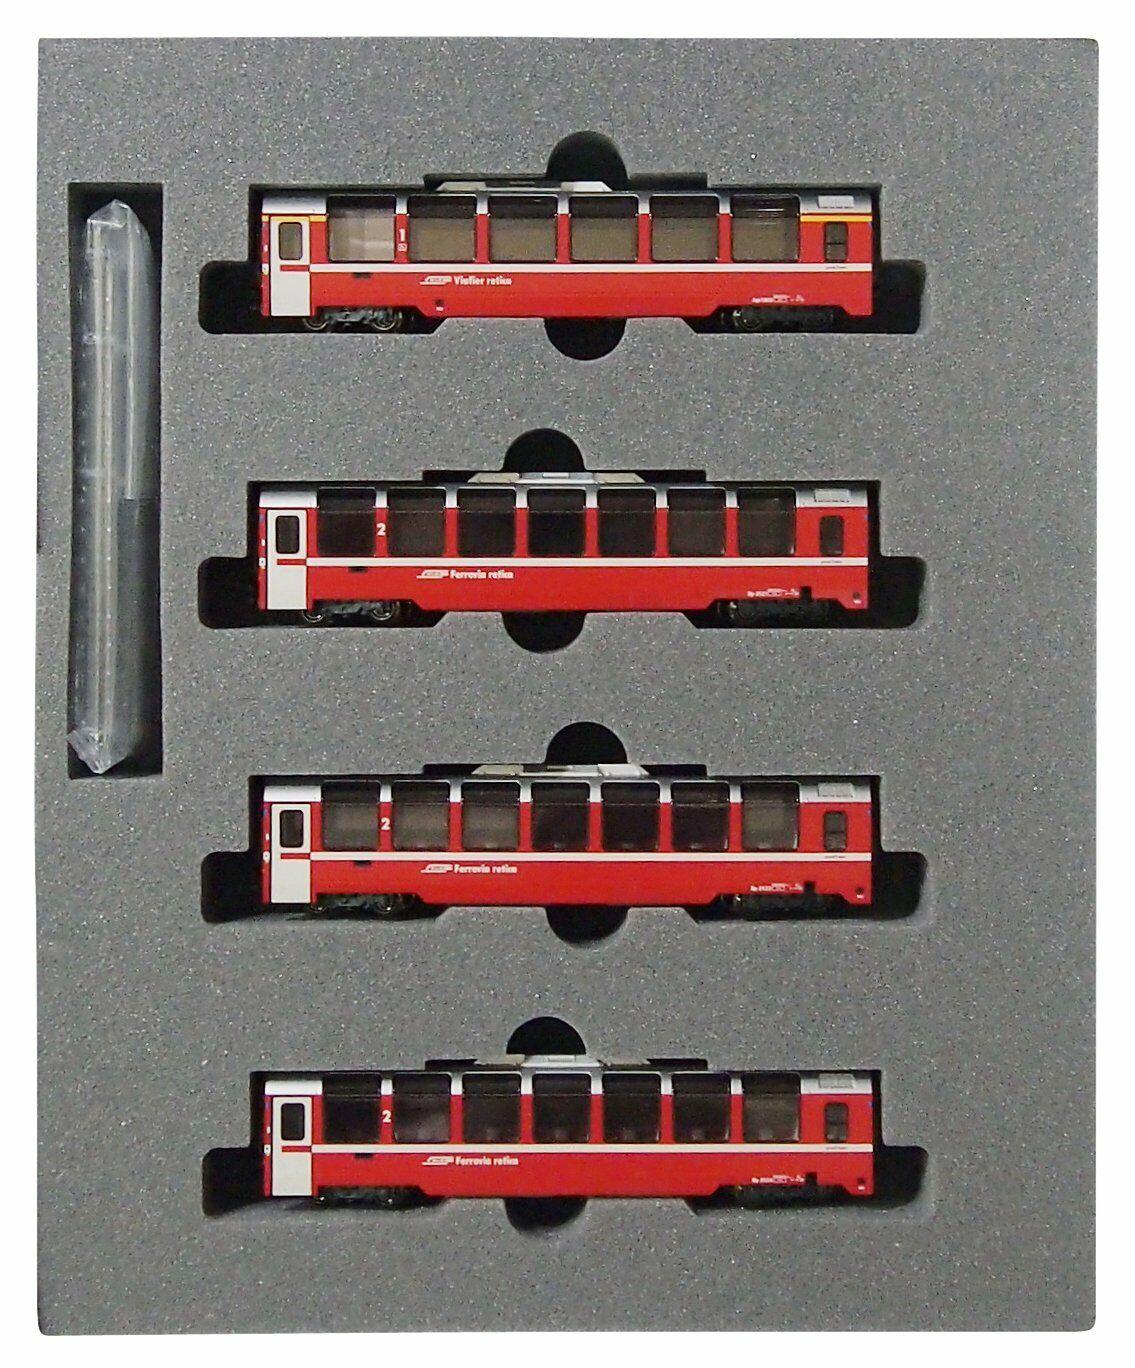 Kato N Calibre Trenes FerroCocheril Bernina Express hematopoyesis 4-Coche Set 10-1319 M